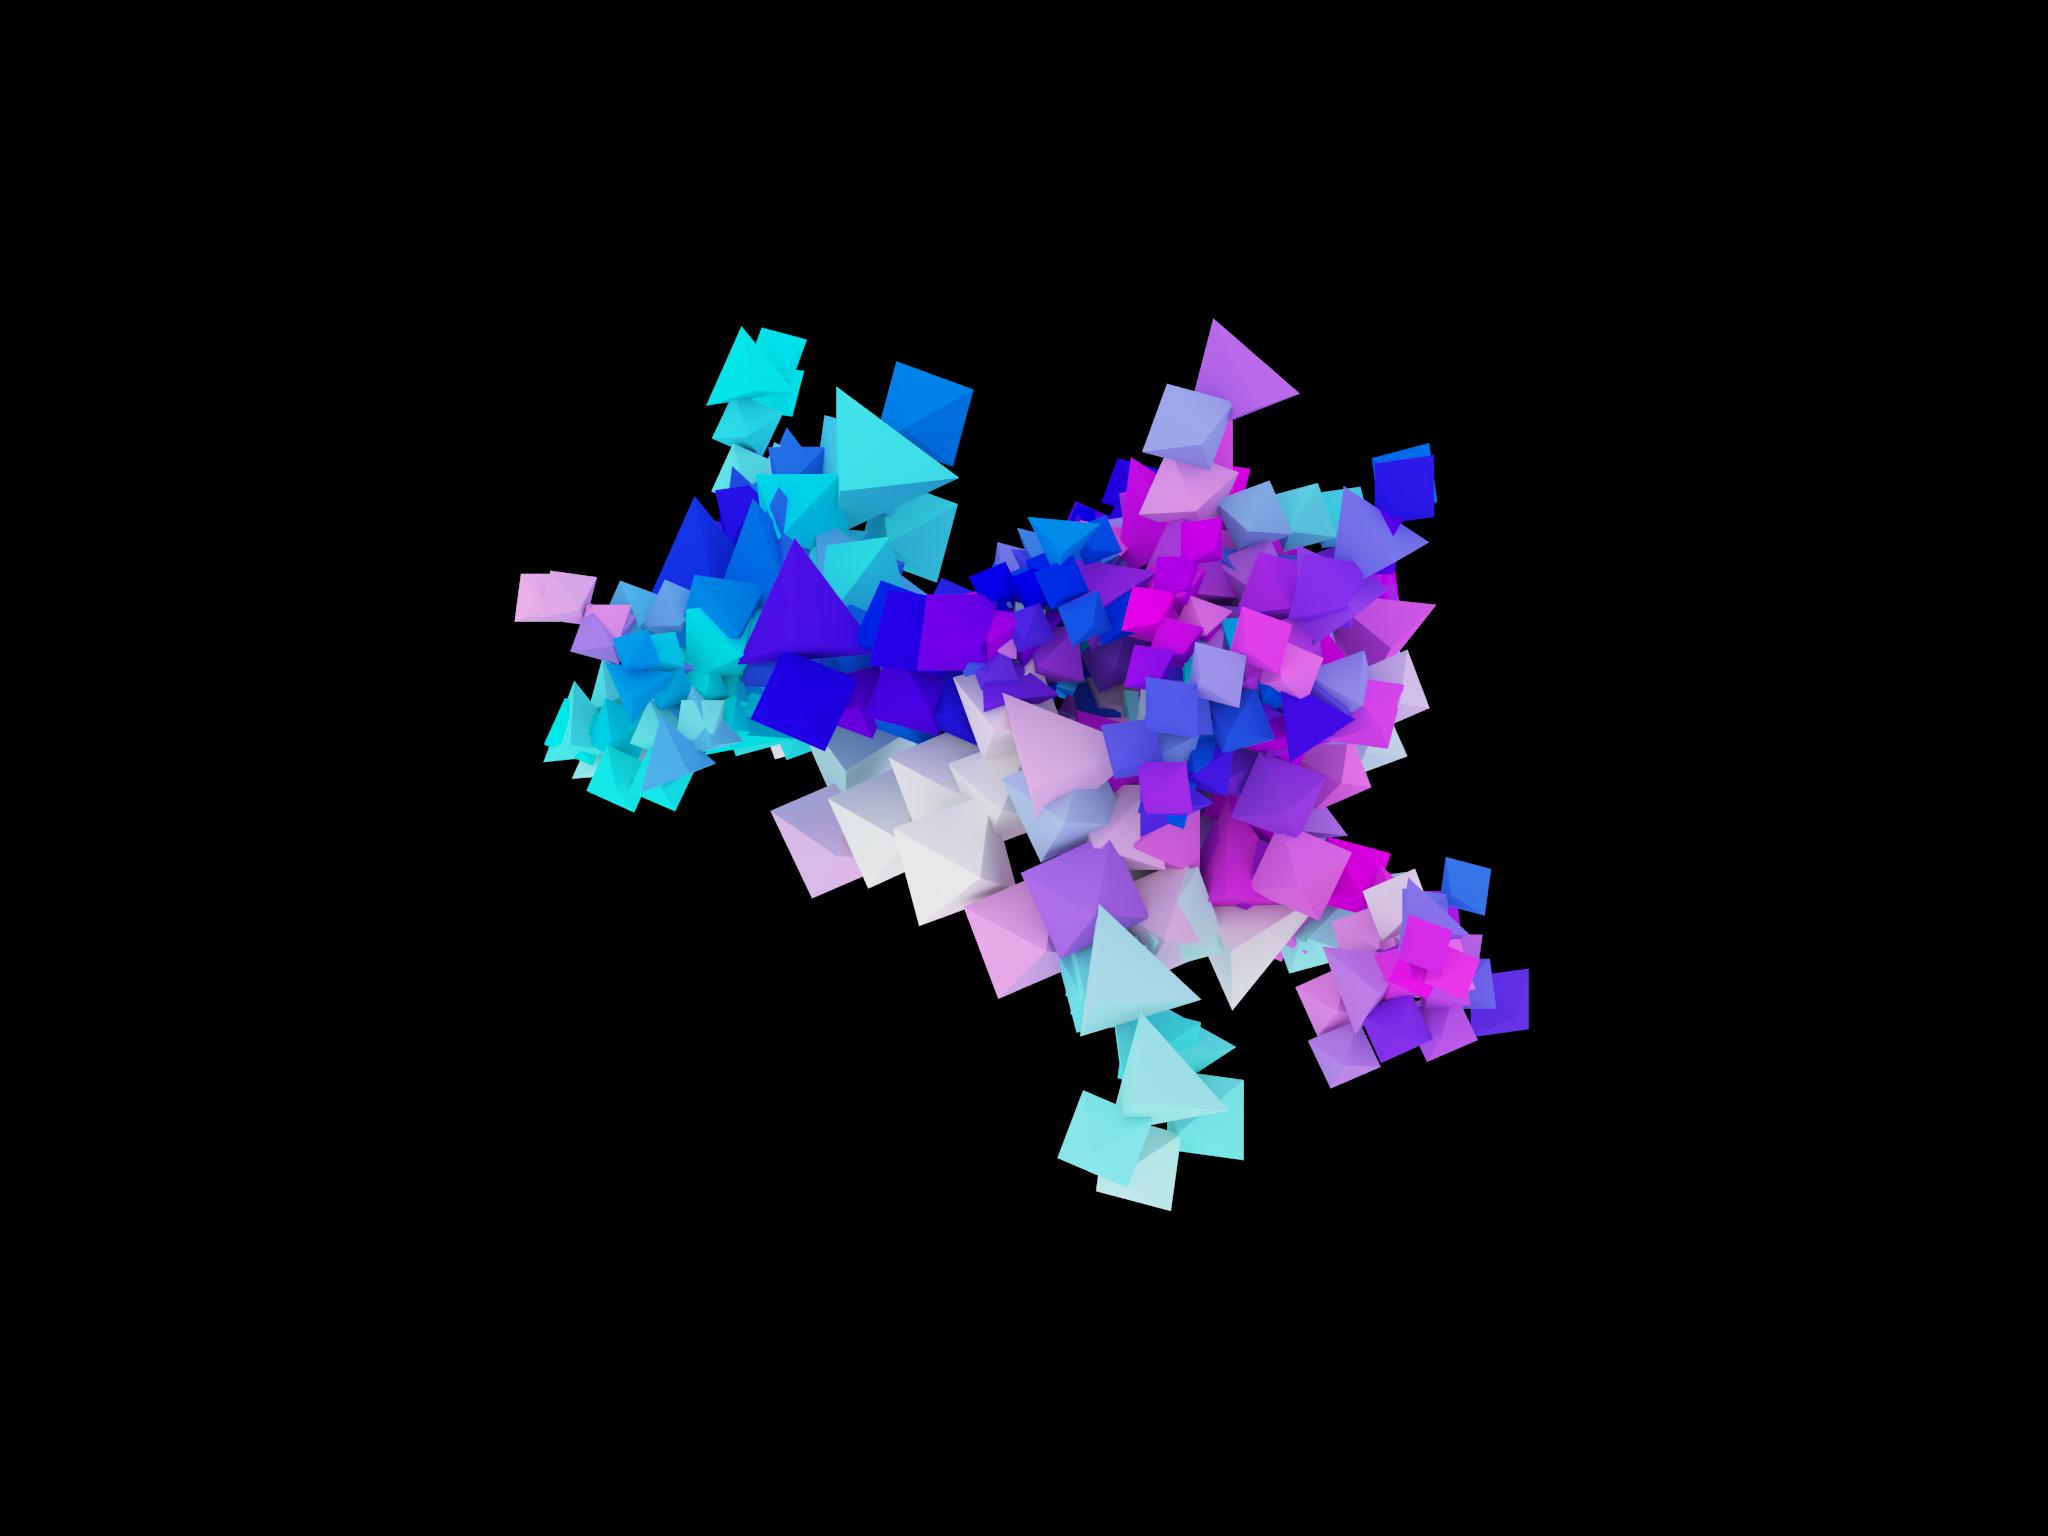 test3_render top.png